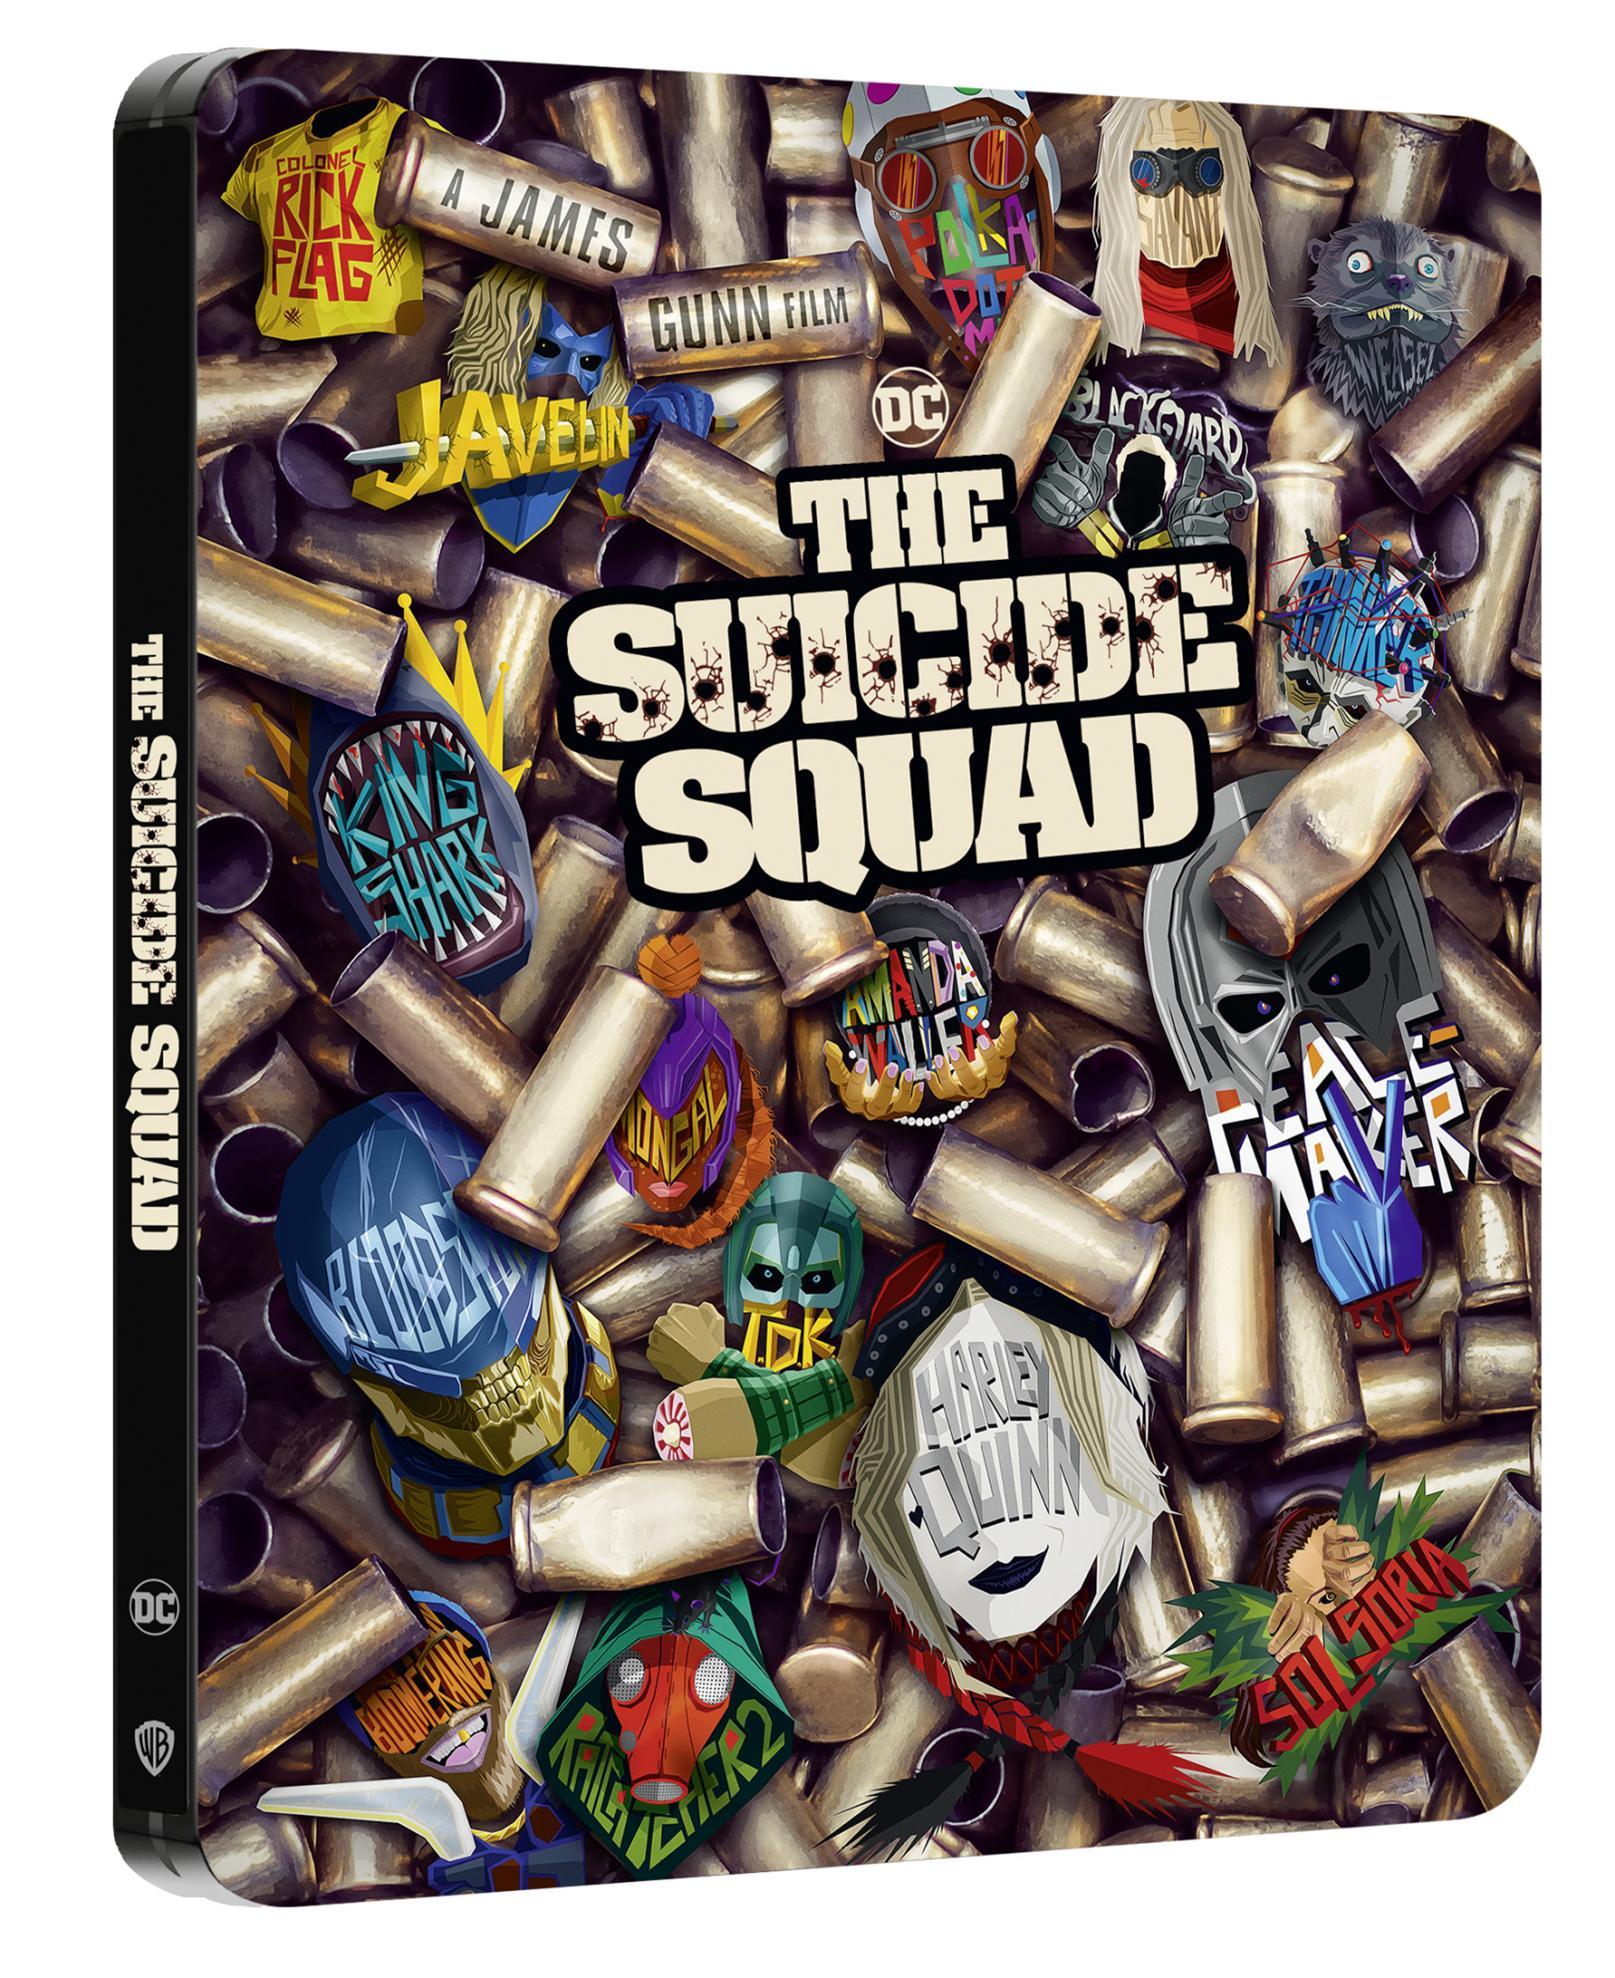 THE SUICIDE SQUAD - MISSIONE SUICIDA (STEELBOOK) (BLU-RAY 4K ULT